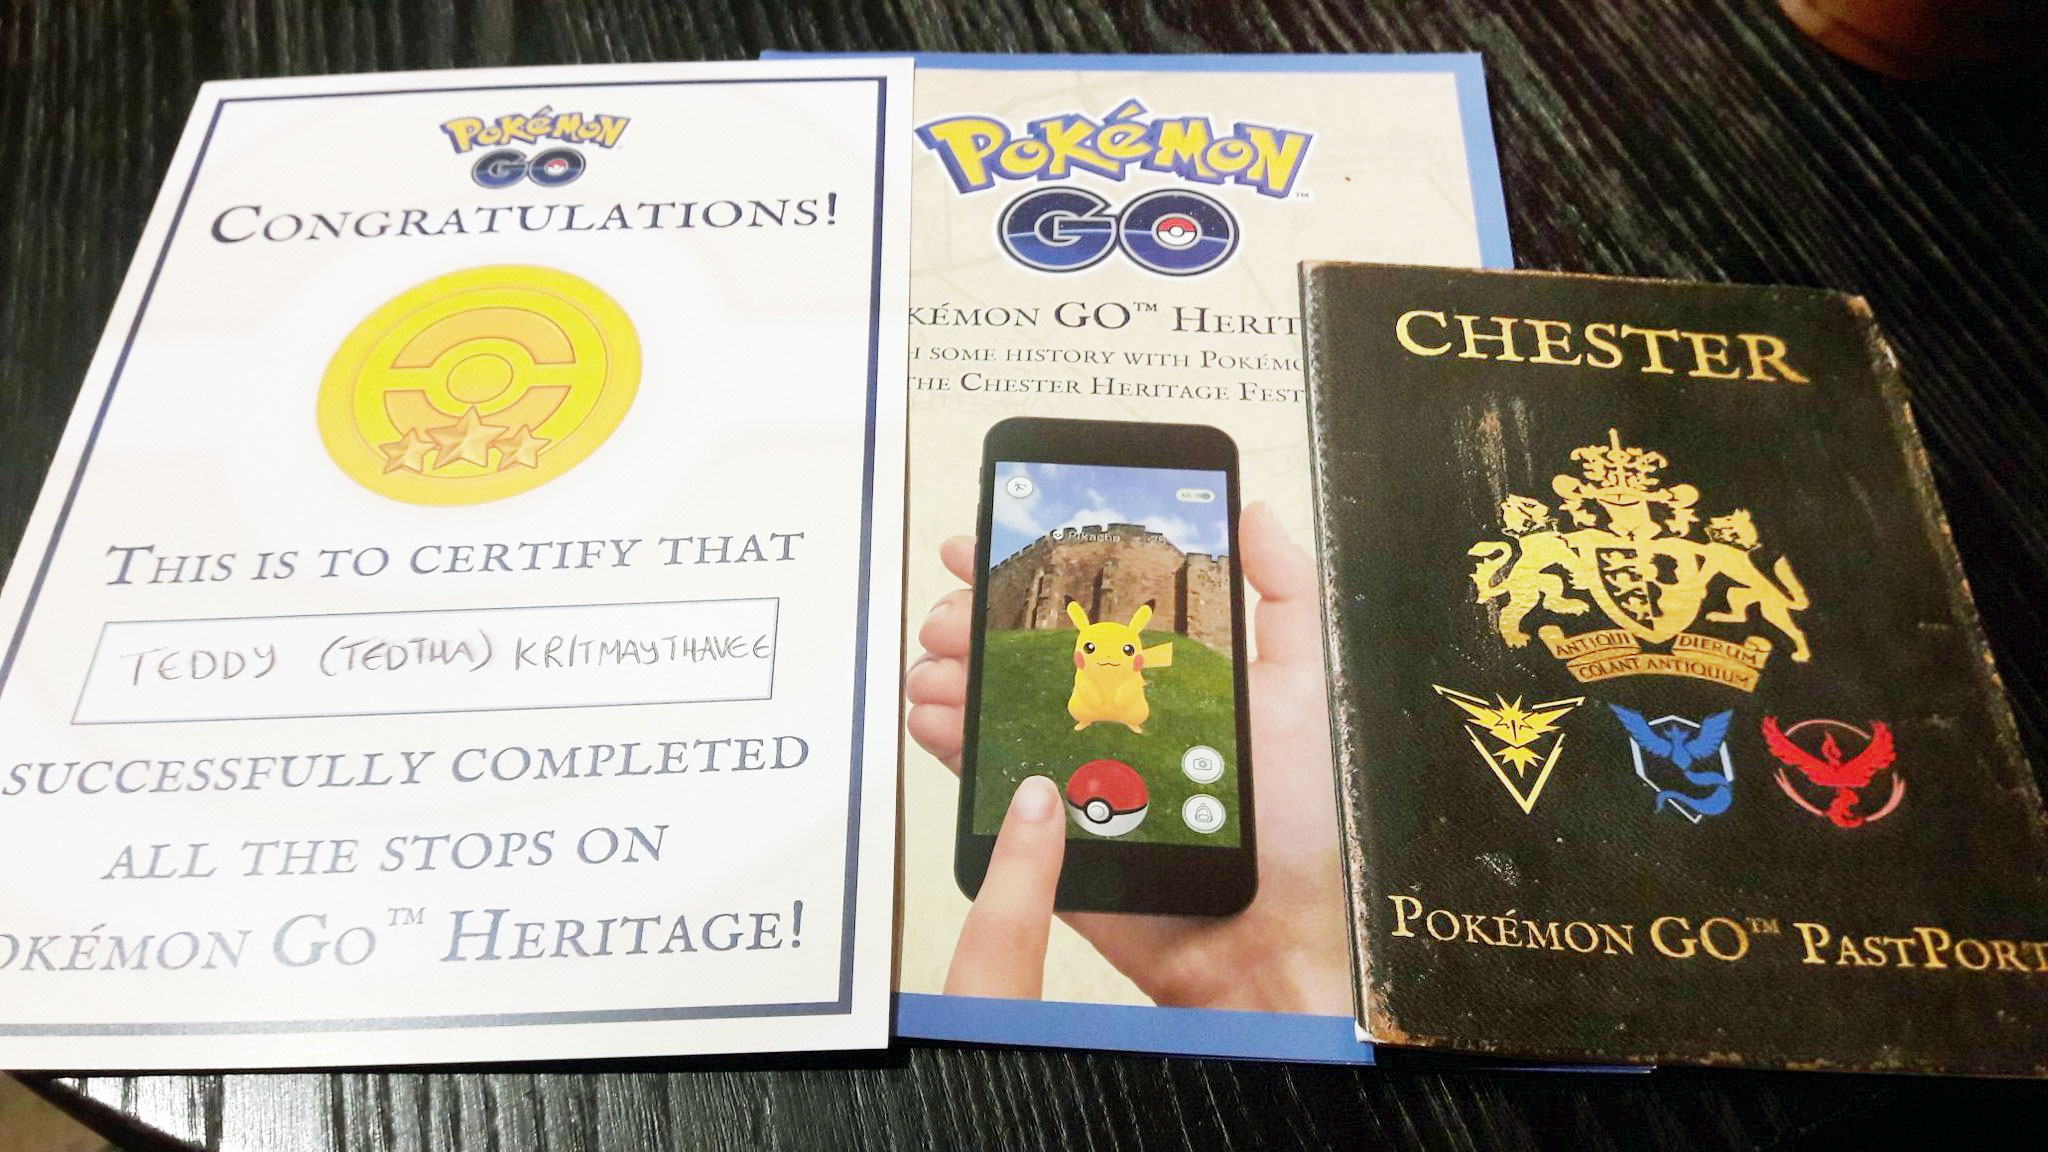 Pokémon GO: Moltres e Zapdos i nuovi Pokémon leggendari in arrivo